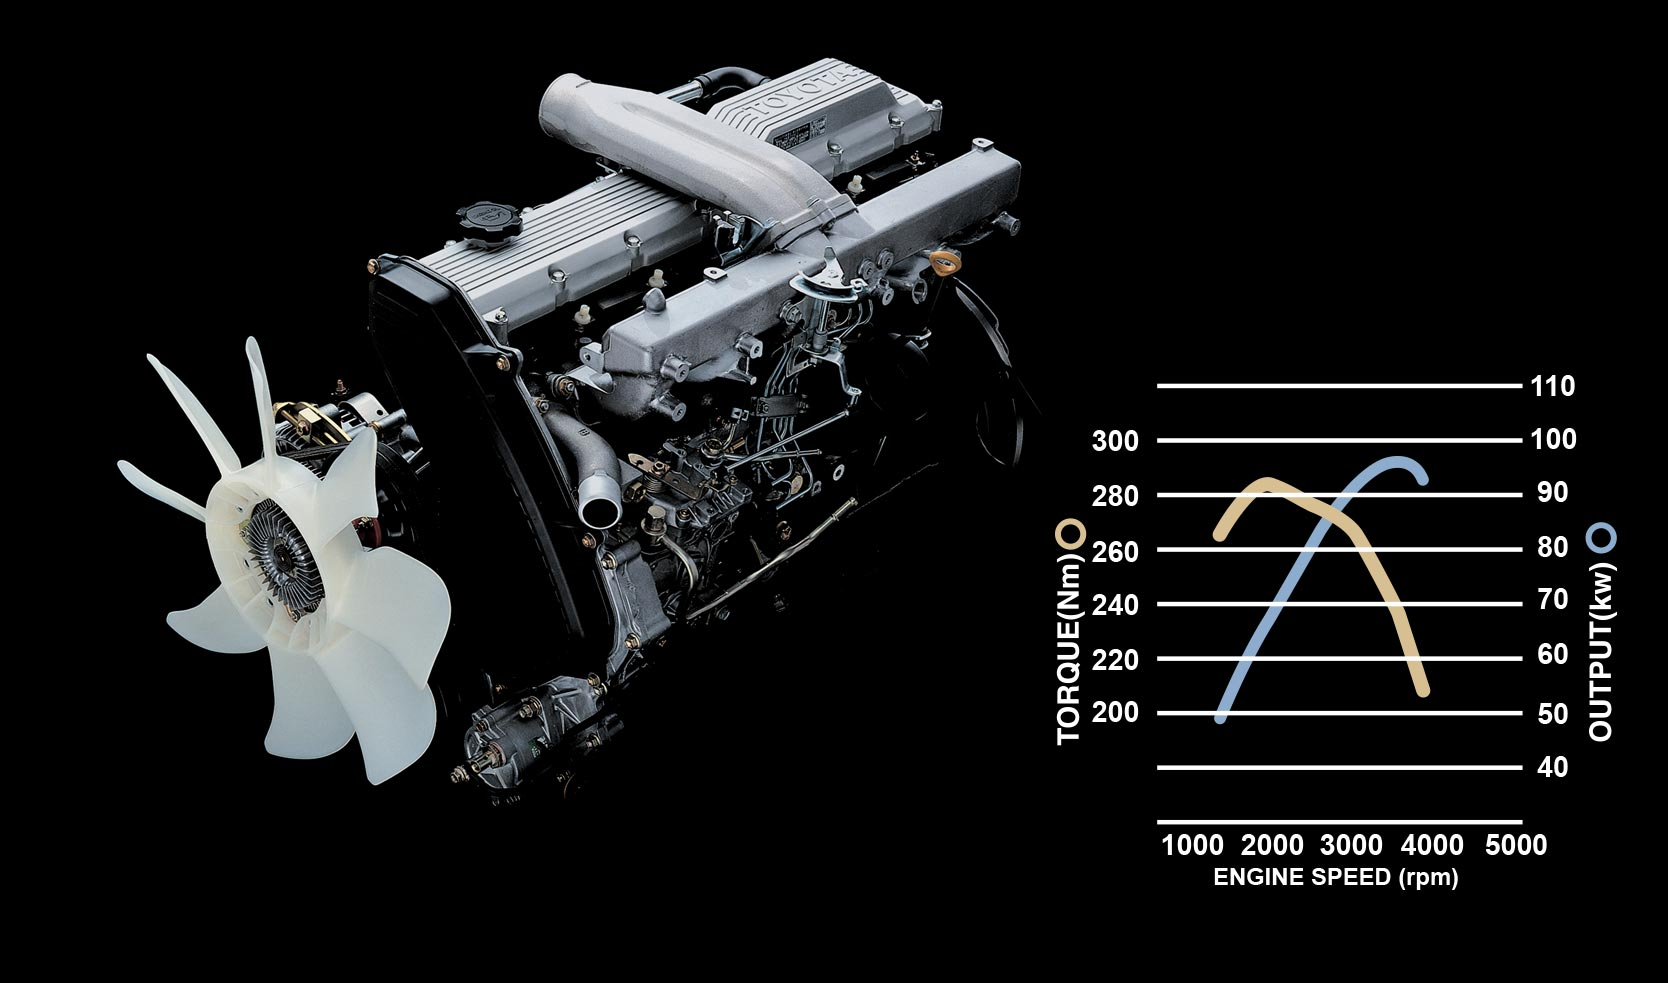 Engine technical data